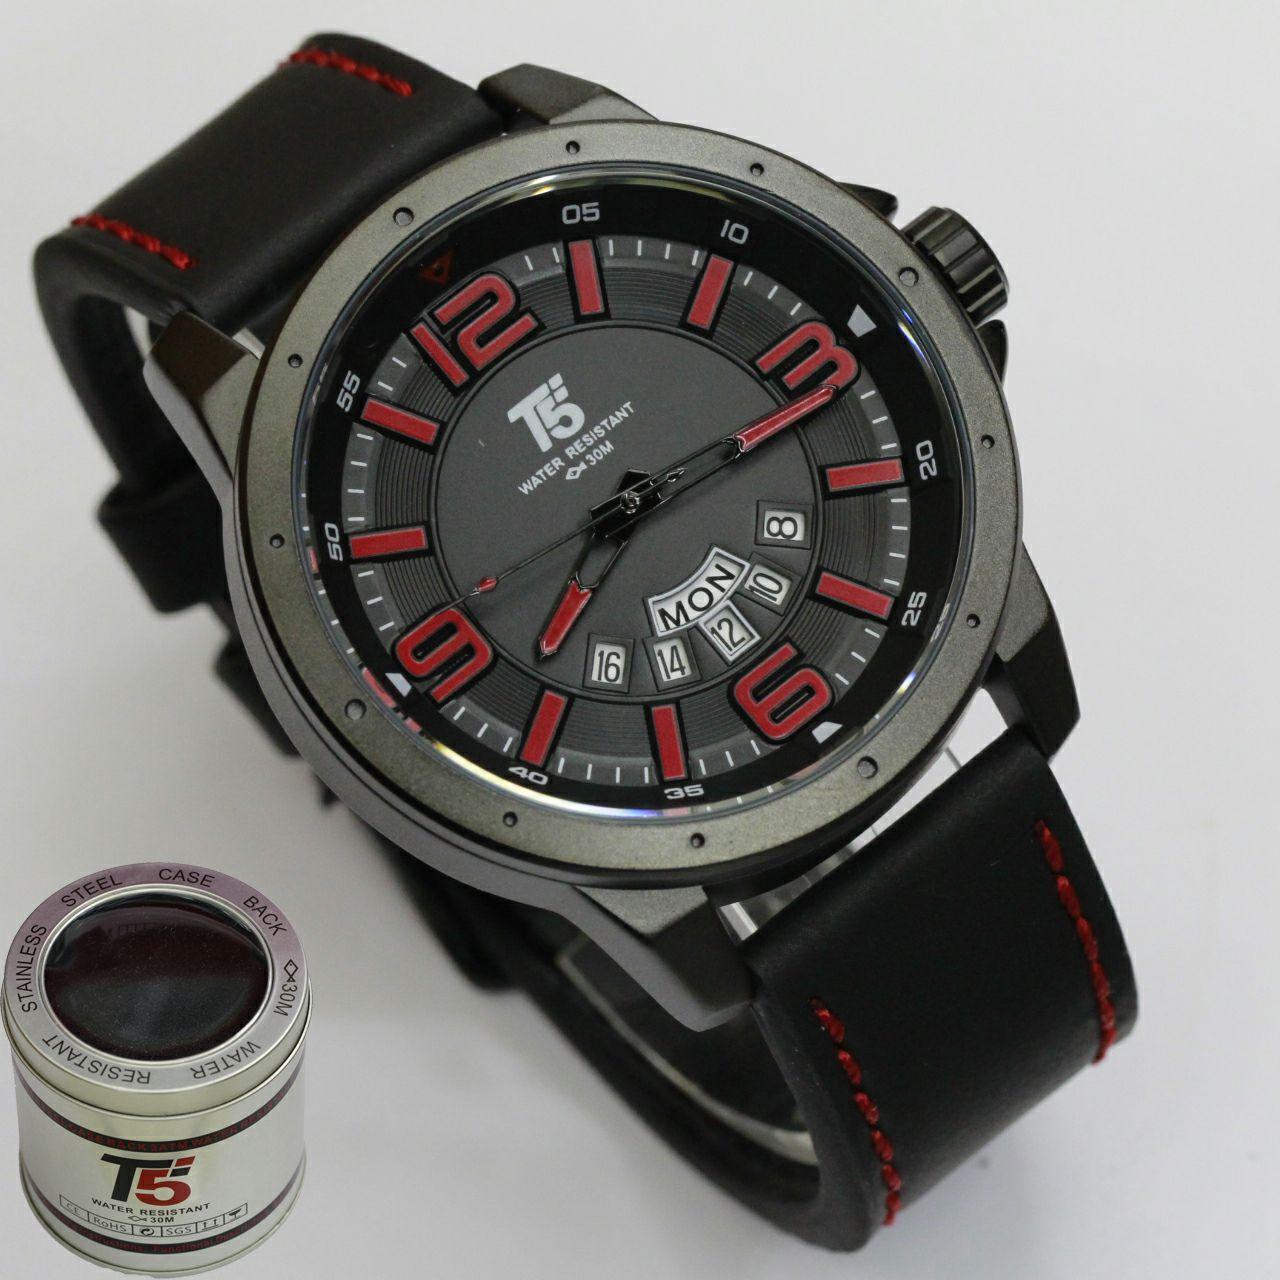 Police Chronograph Jam Tangan Pria Hitam Biru Leather Strap P327 14690jsb 12ap Coklat Ring T5 H3563 Original Aktif Casual For Men